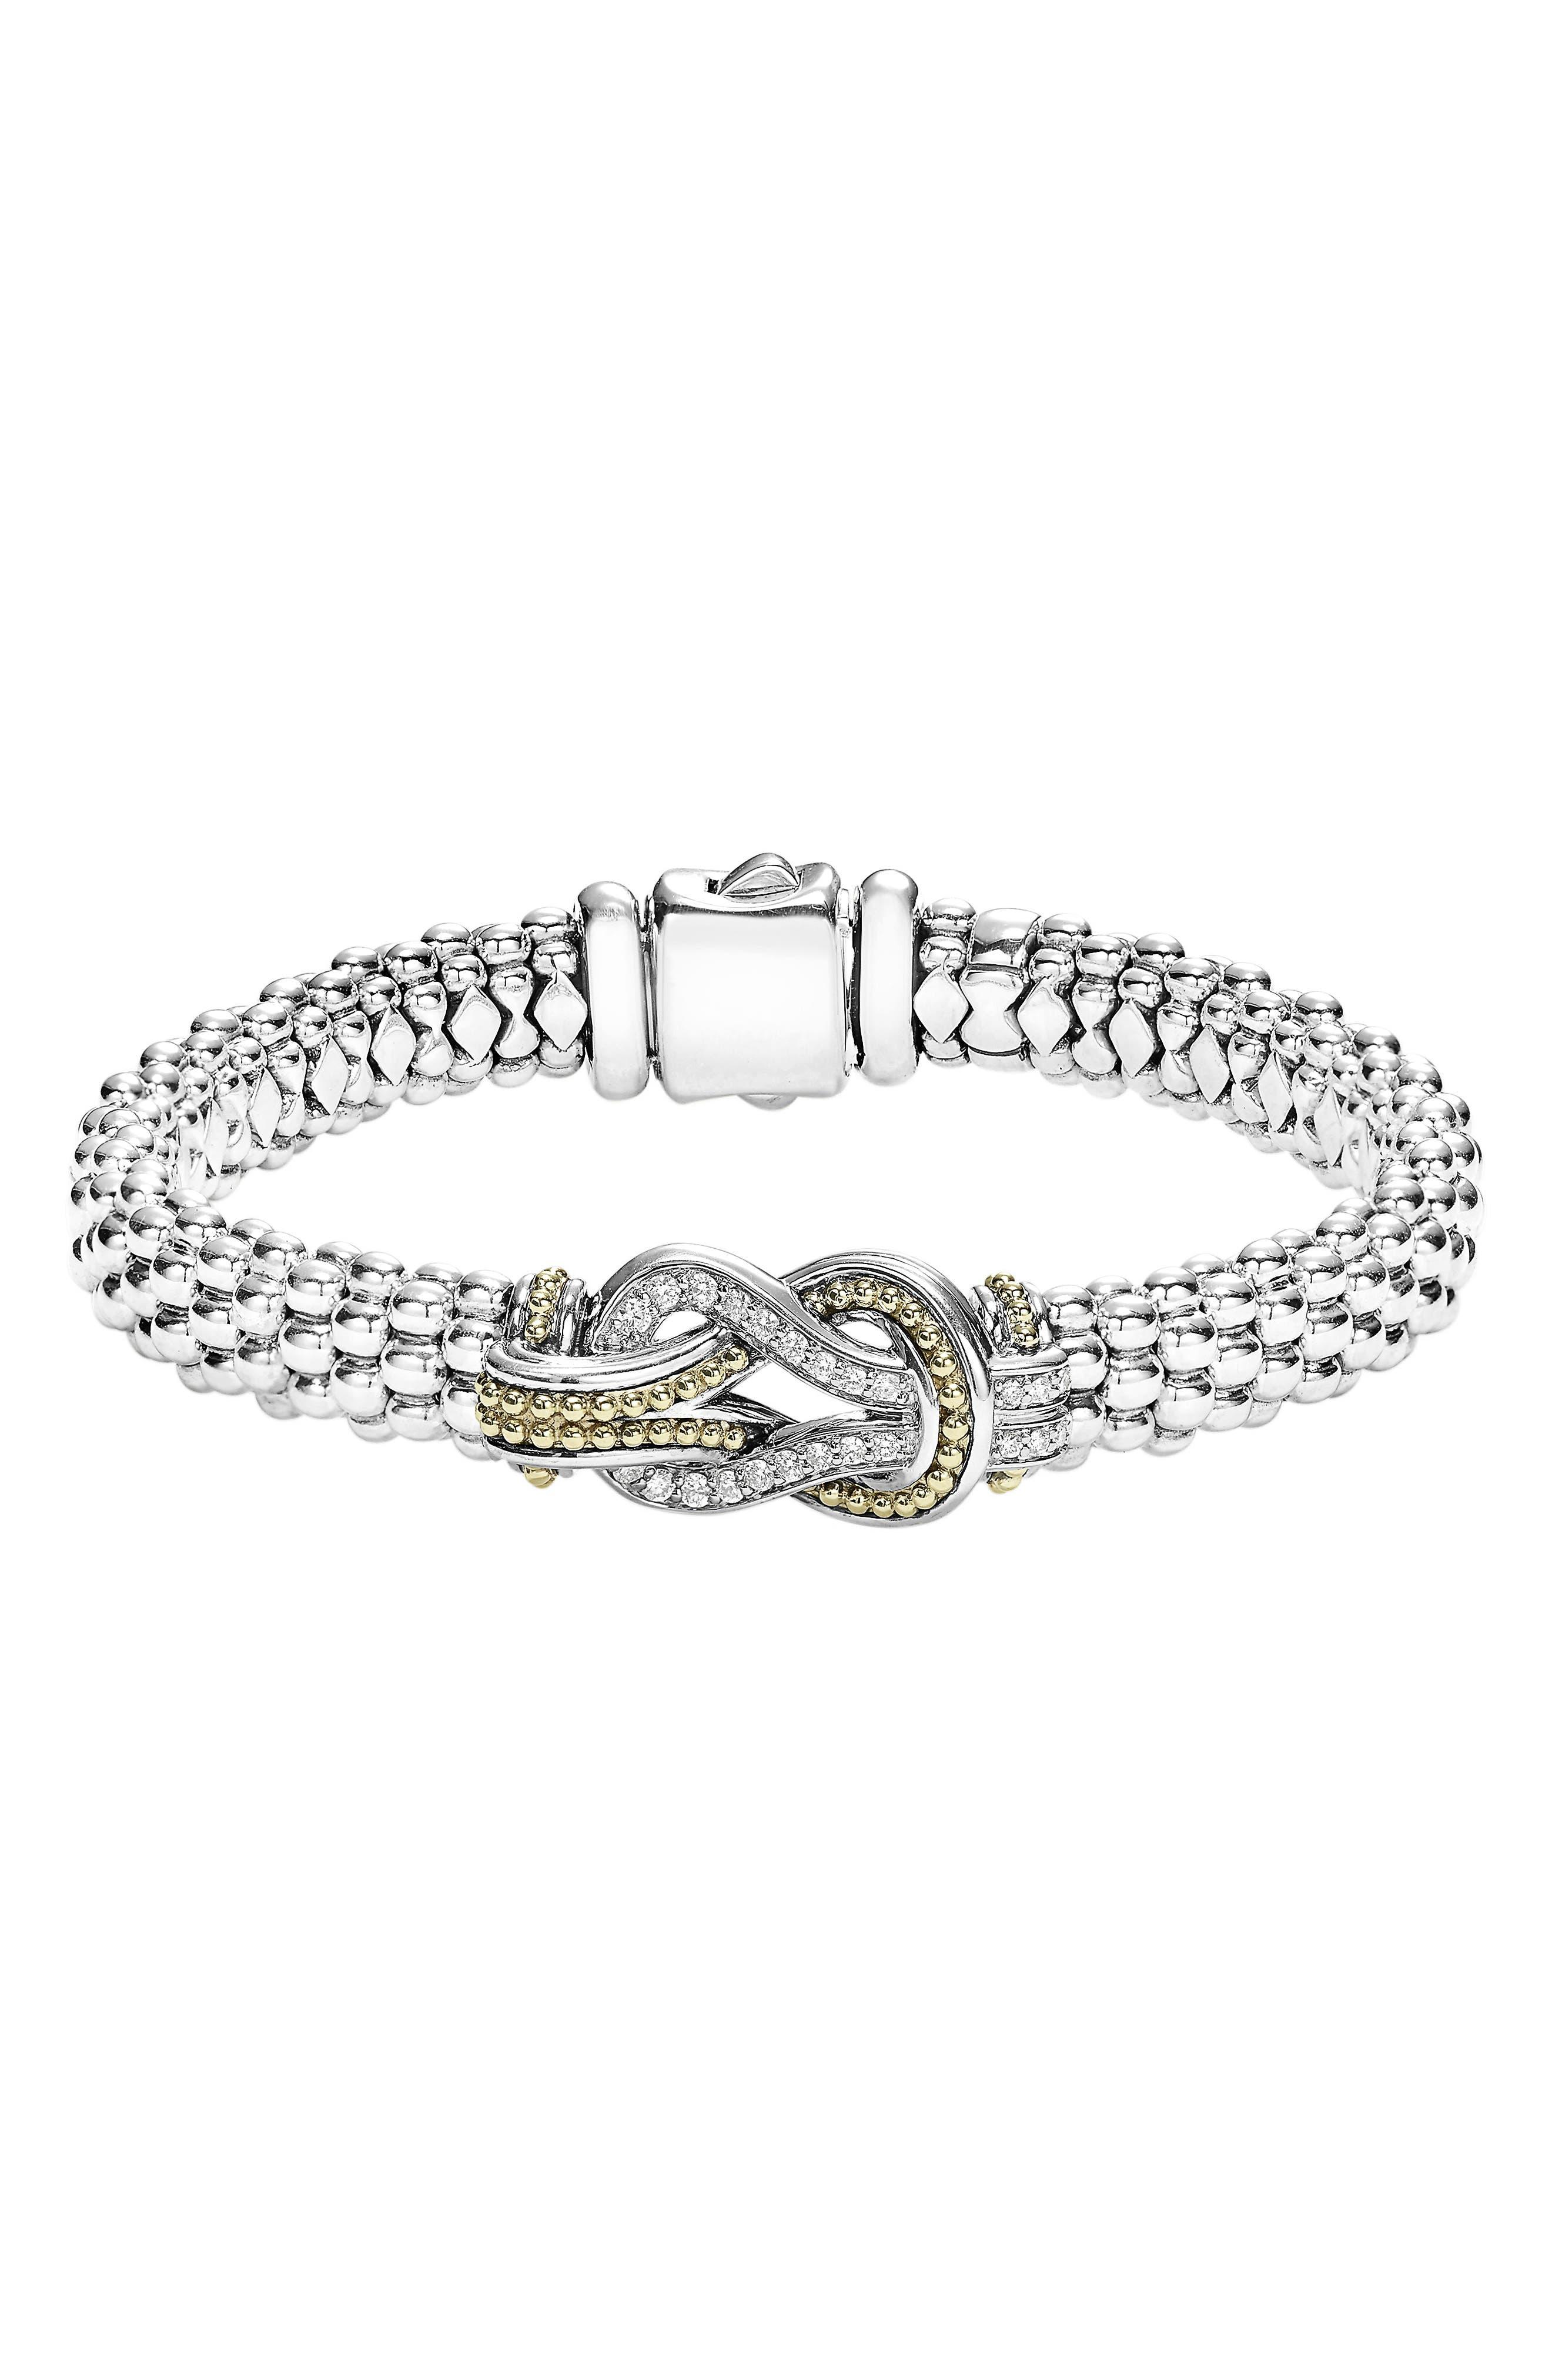 Caviar Newport Diamond Station Bracelet,                             Main thumbnail 1, color,                             SILVER/ GOLD